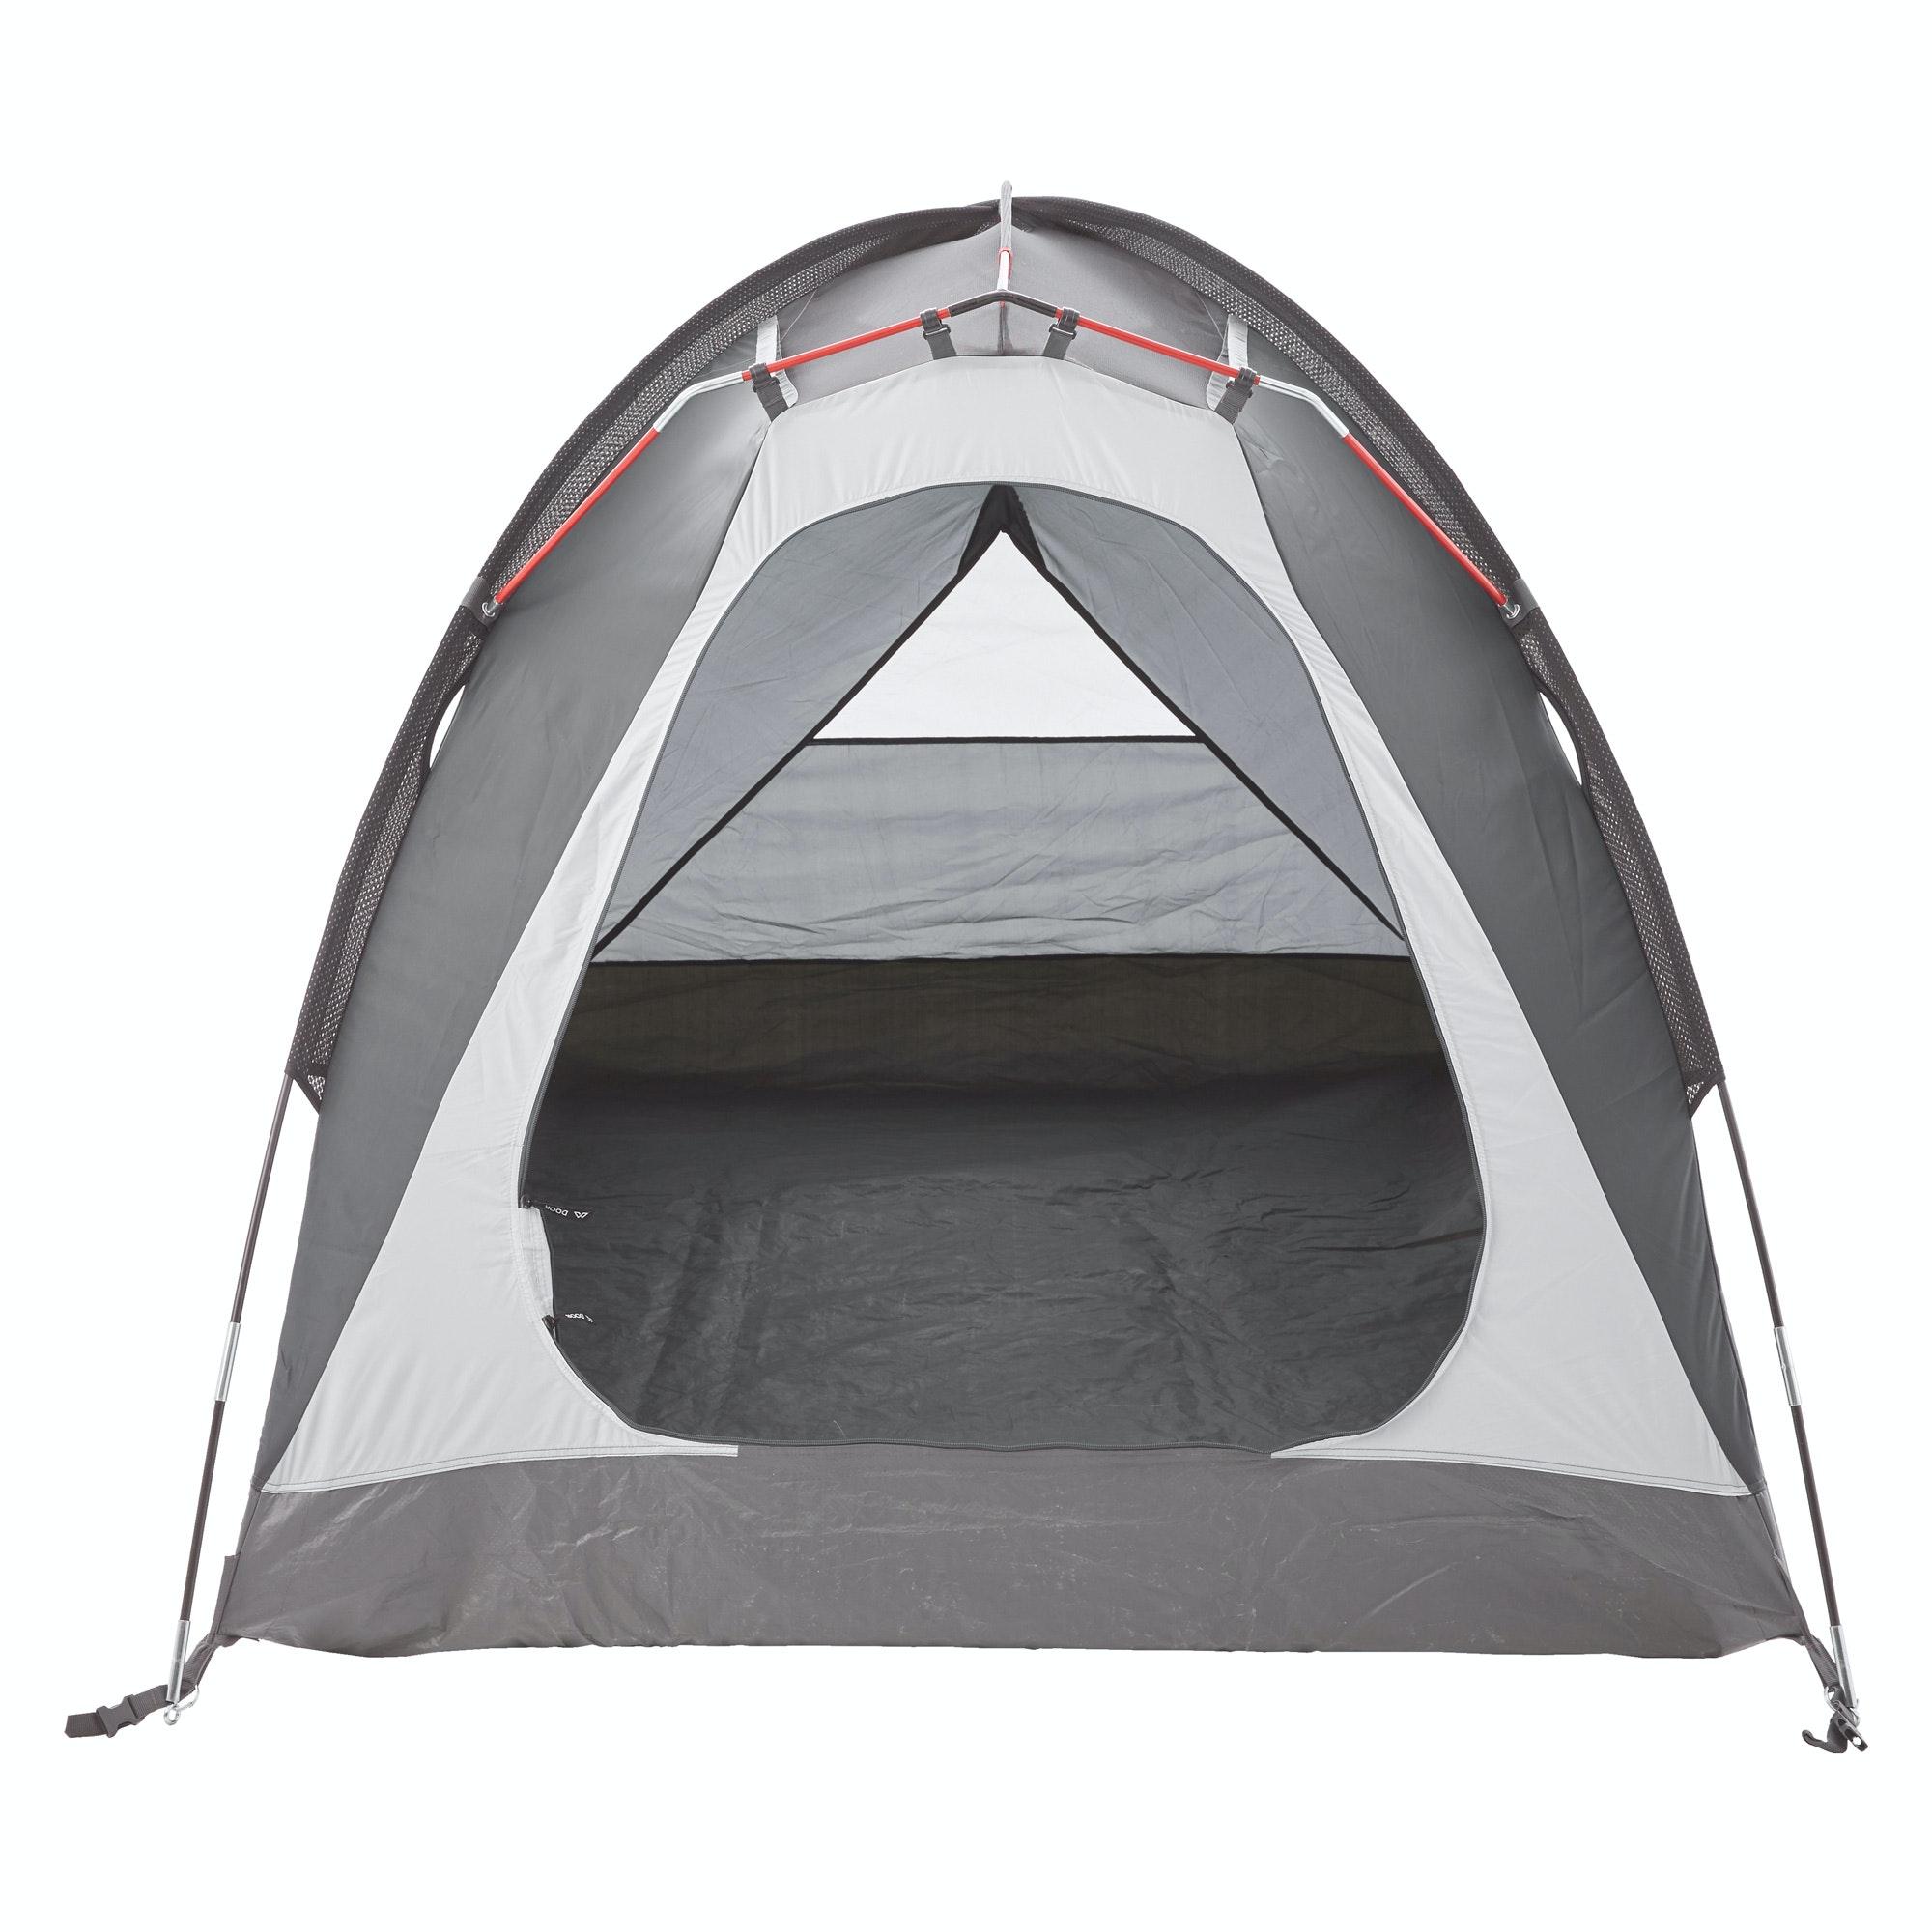 NEW-Kathmandu-Retreat-40-2-Person-Waterproof-Compact-Camping-Hiking-Tent thumbnail 11